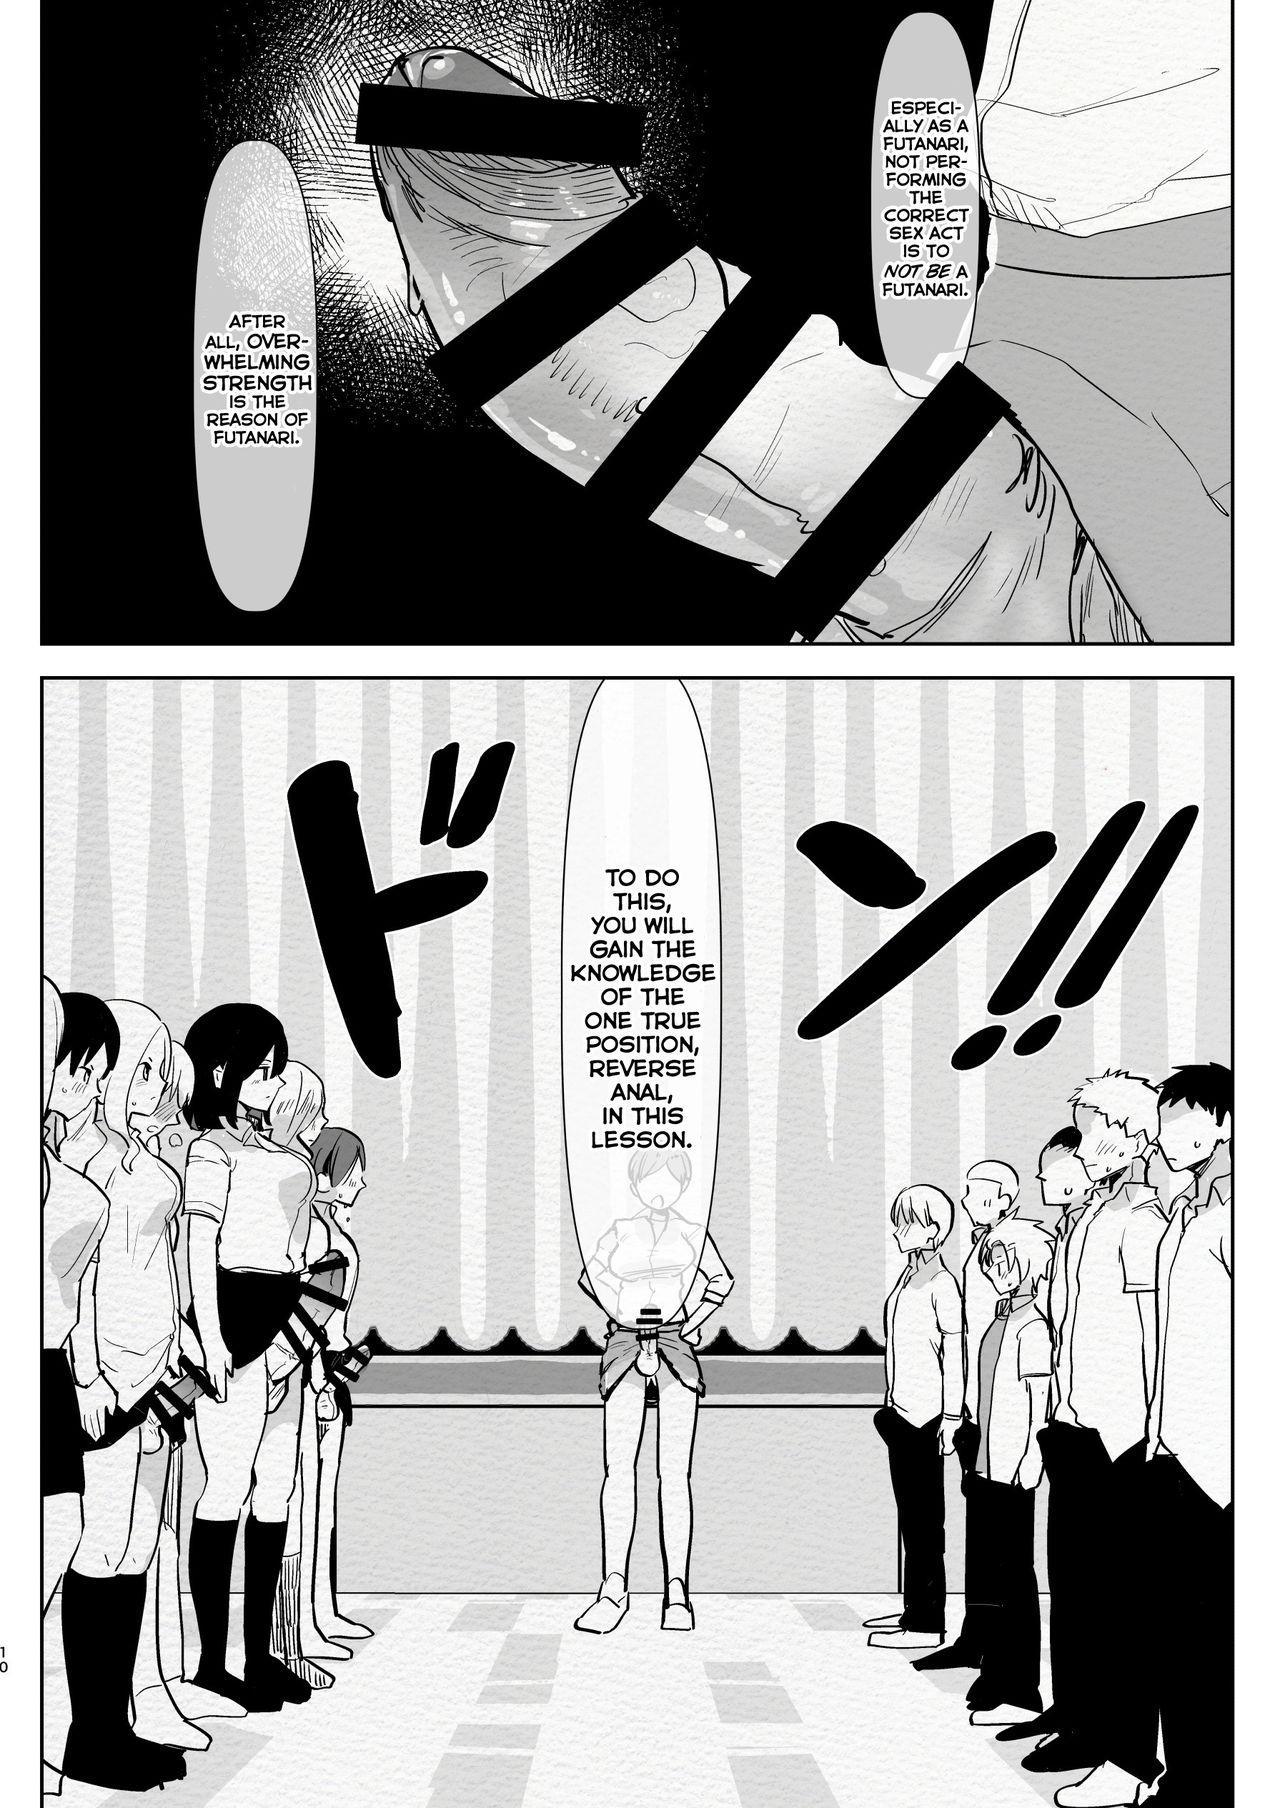 Futanari Osananajimi to Ore to Hajimete no Gyaku Anal Kagai Jugyou | Me and My Futanari Childhood Friend's First Extracurricular Lesson in Reverse Anal 9